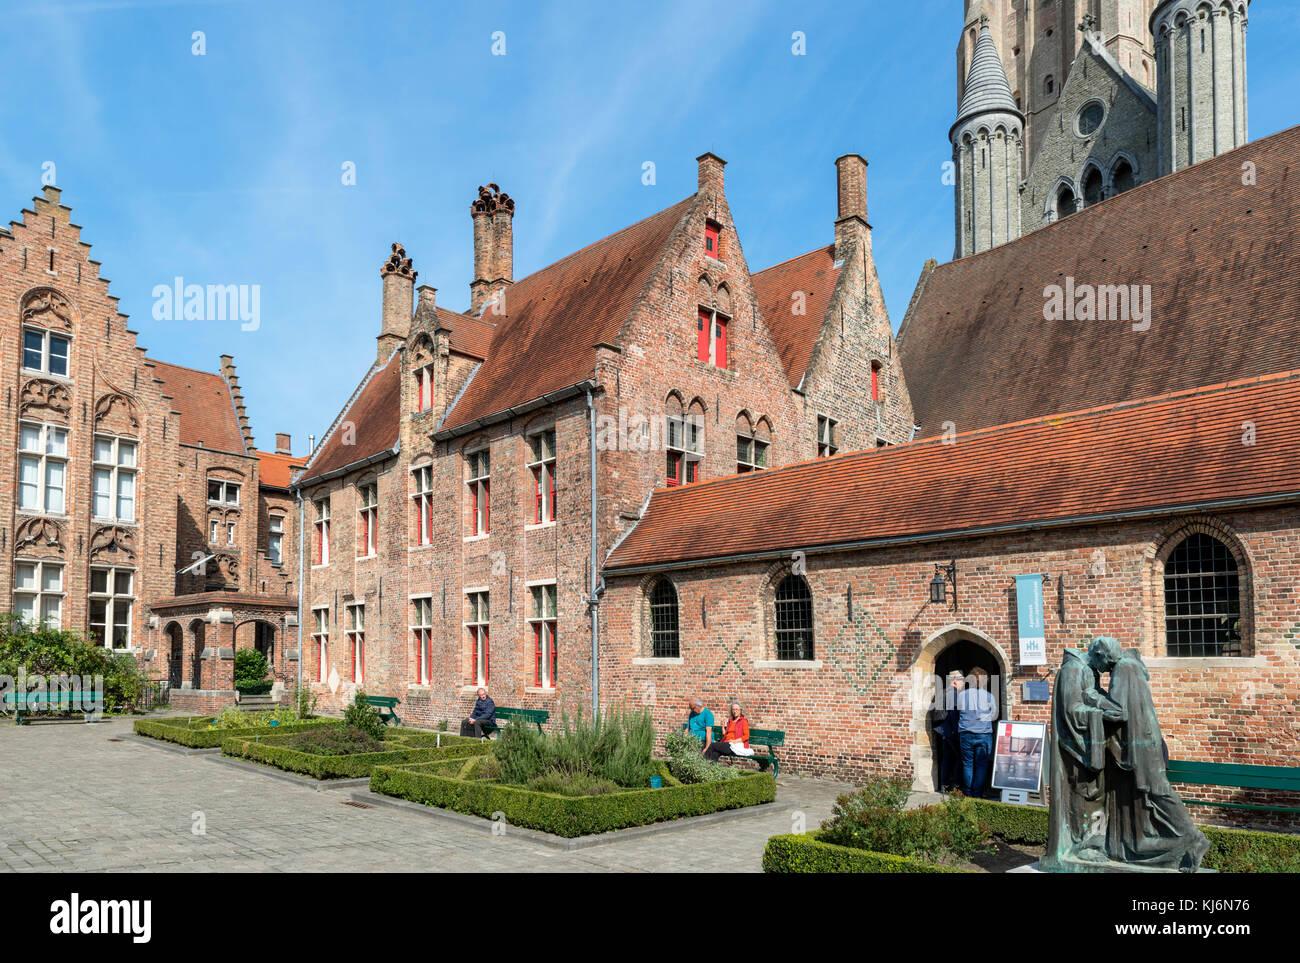 Le vieux St John's Hospital (Oud Sint-Janshospitaal), Bruges (Brugge), Belgique Photo Stock